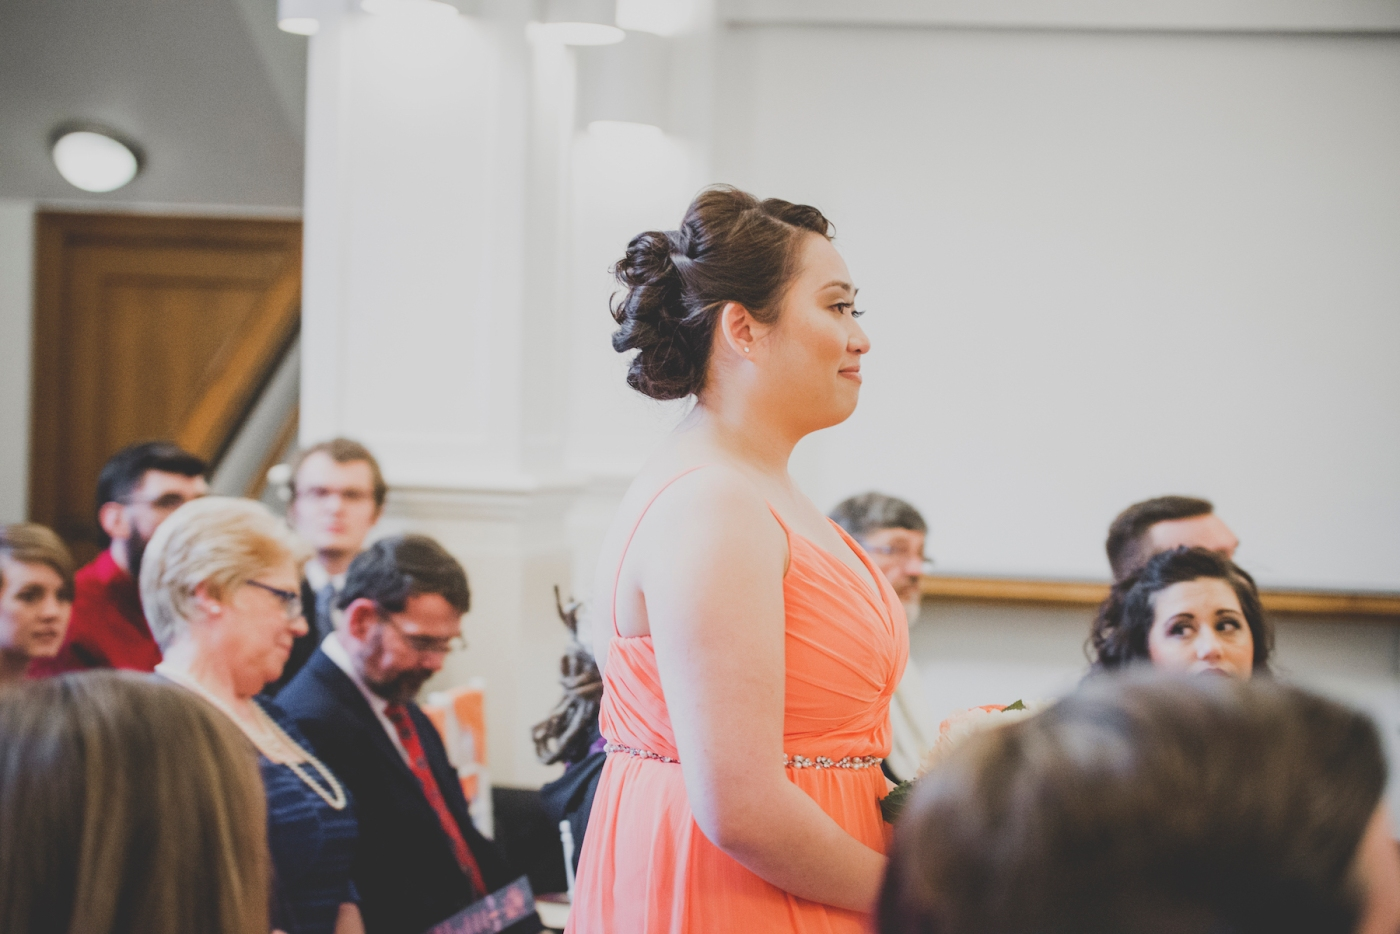 DSC_2540Everett_Wedding_Ballroom_Jane_Speleers_photography_Rachel_and_Edmund_Ceremony_2017